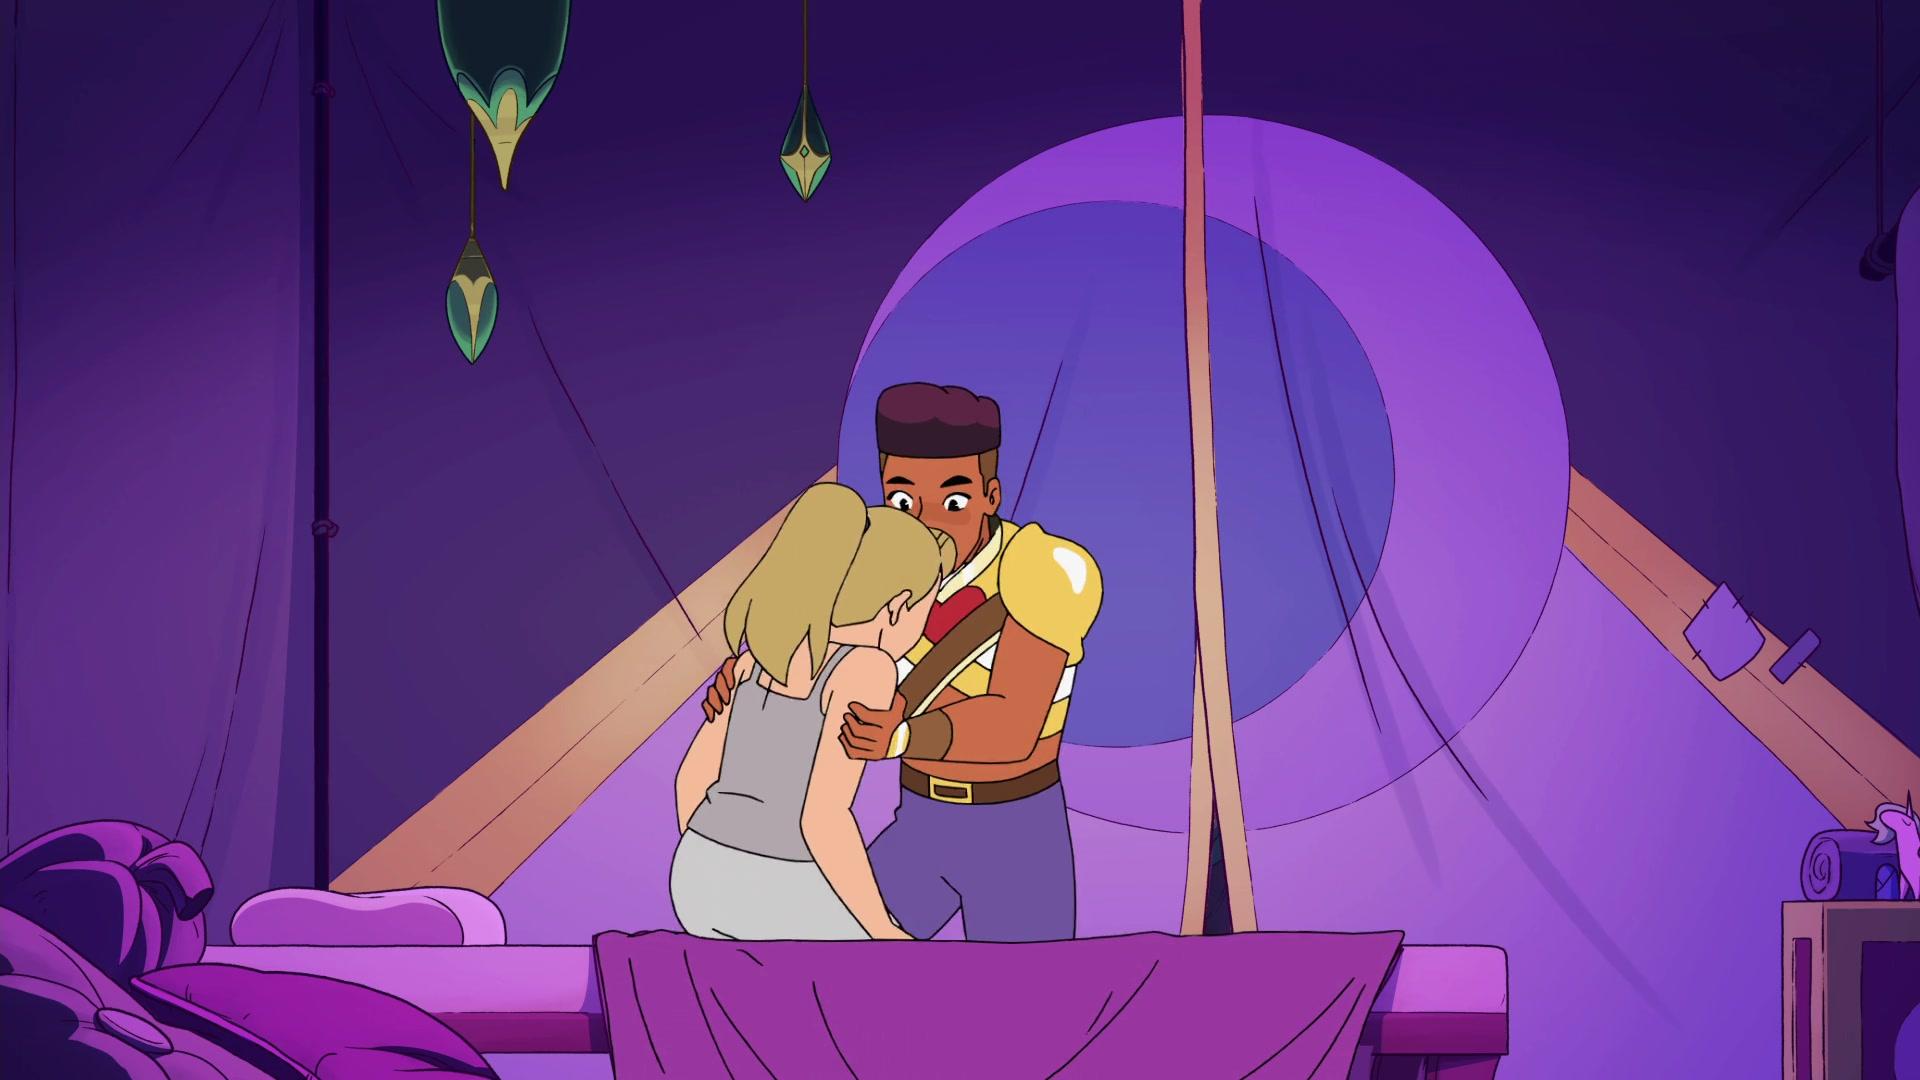 She-Ra and the Princesses of Power S05E02